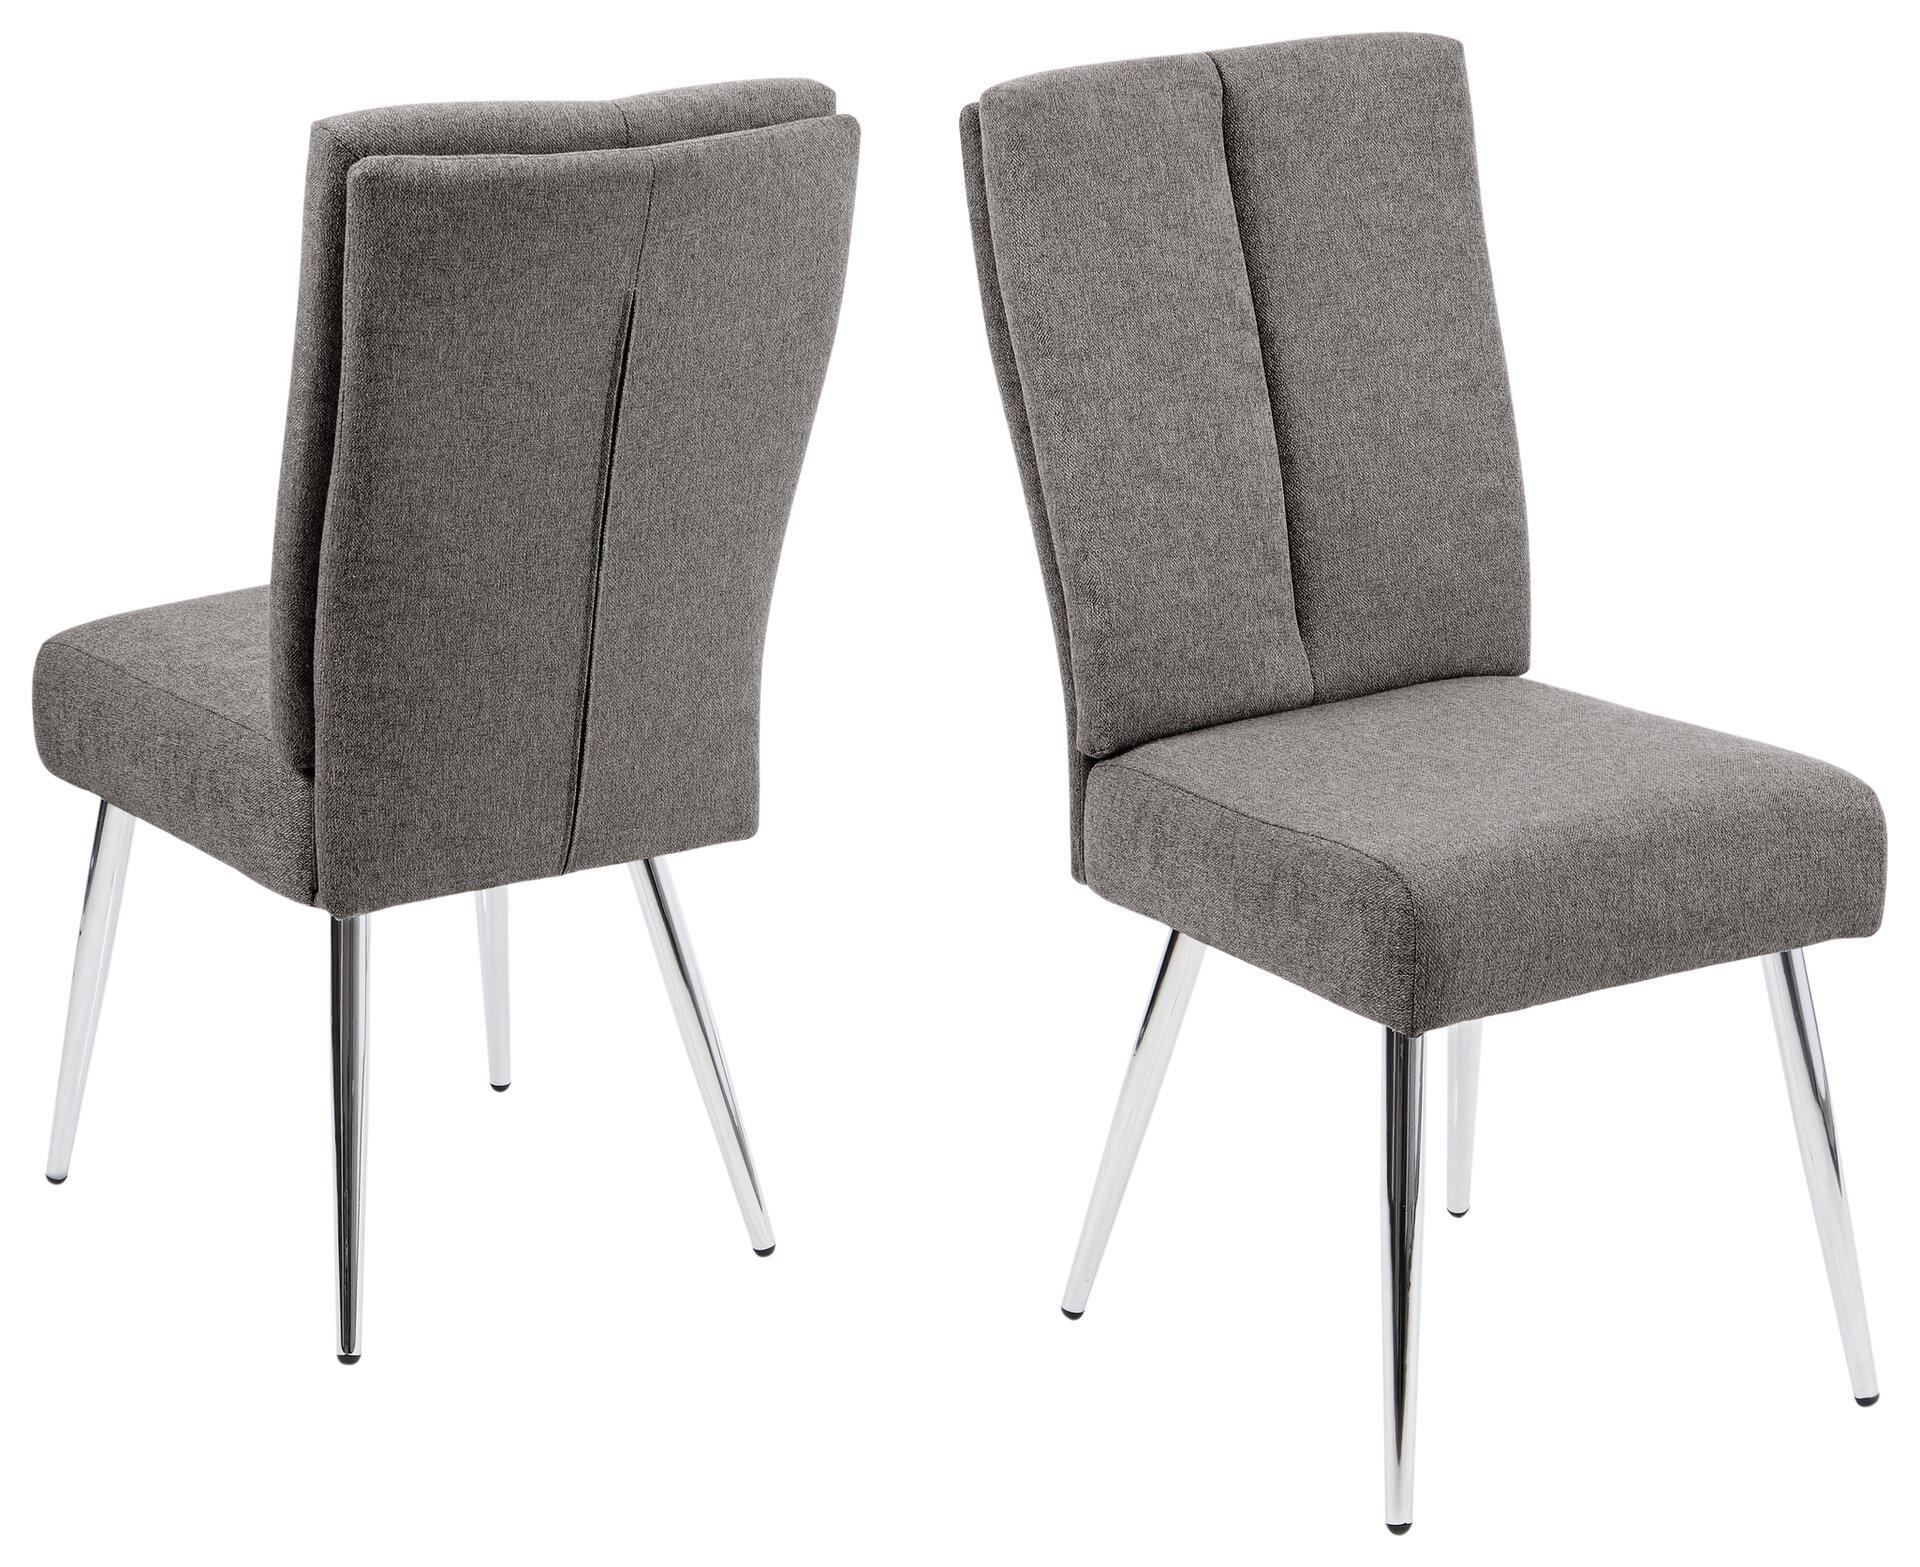 4-Fuß-Stuhl BARI LIV'IN Textil grau 59 x 97 x 45 cm